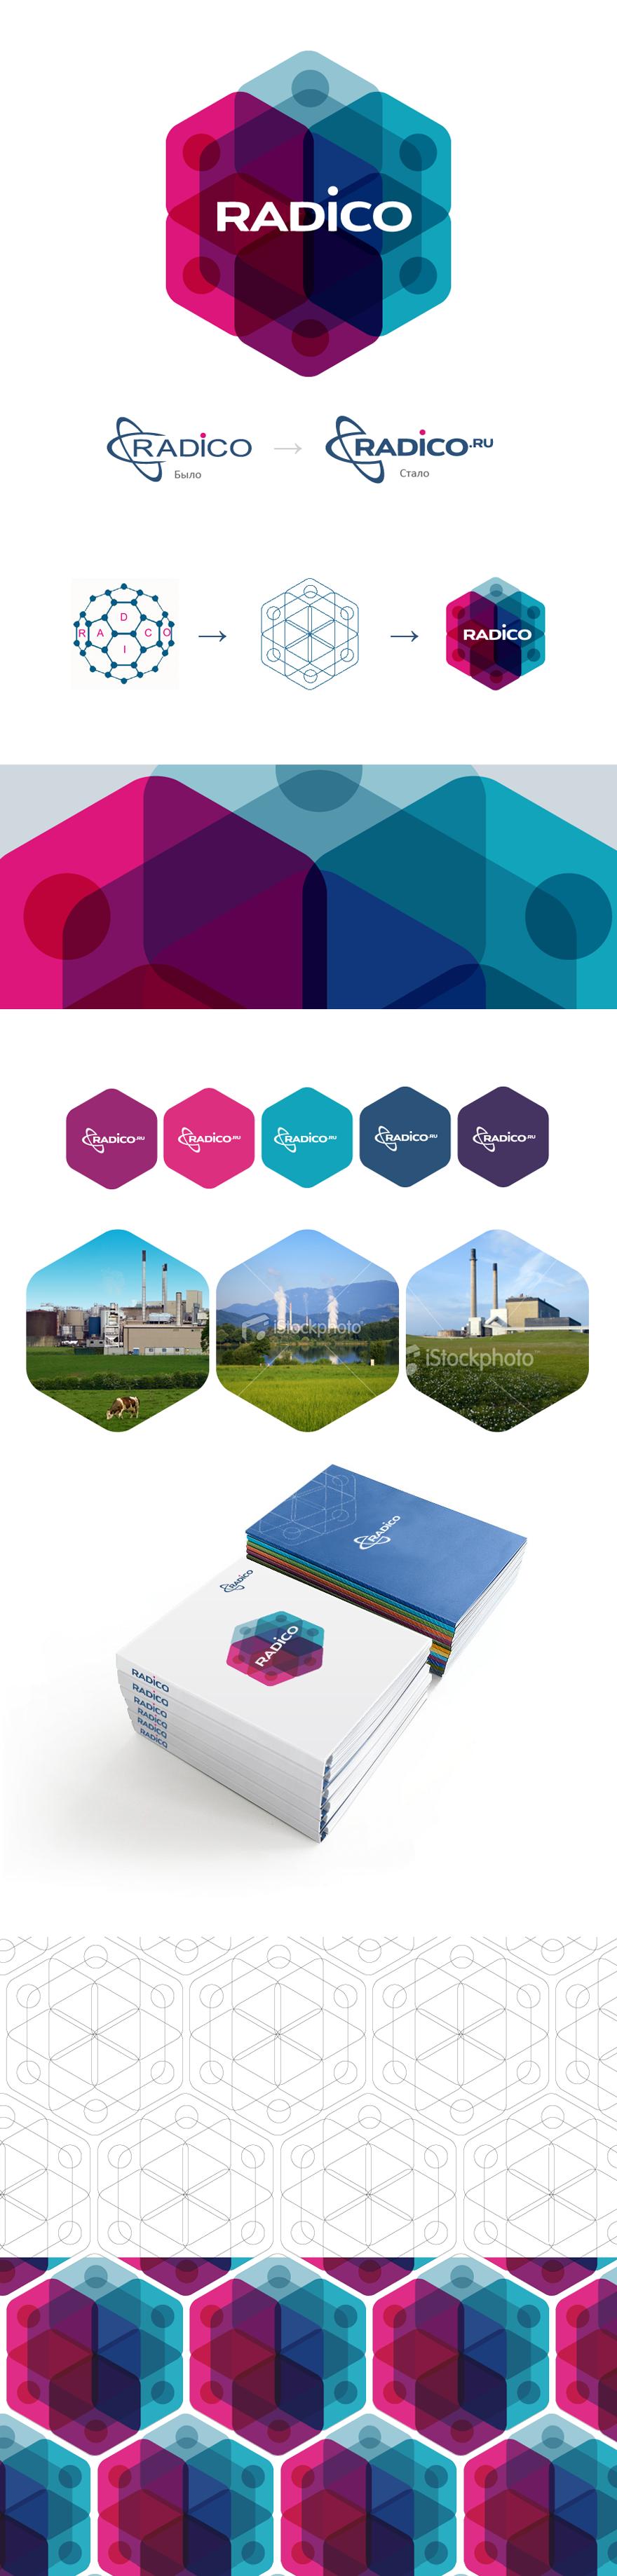 Radico - Logos - Creattica